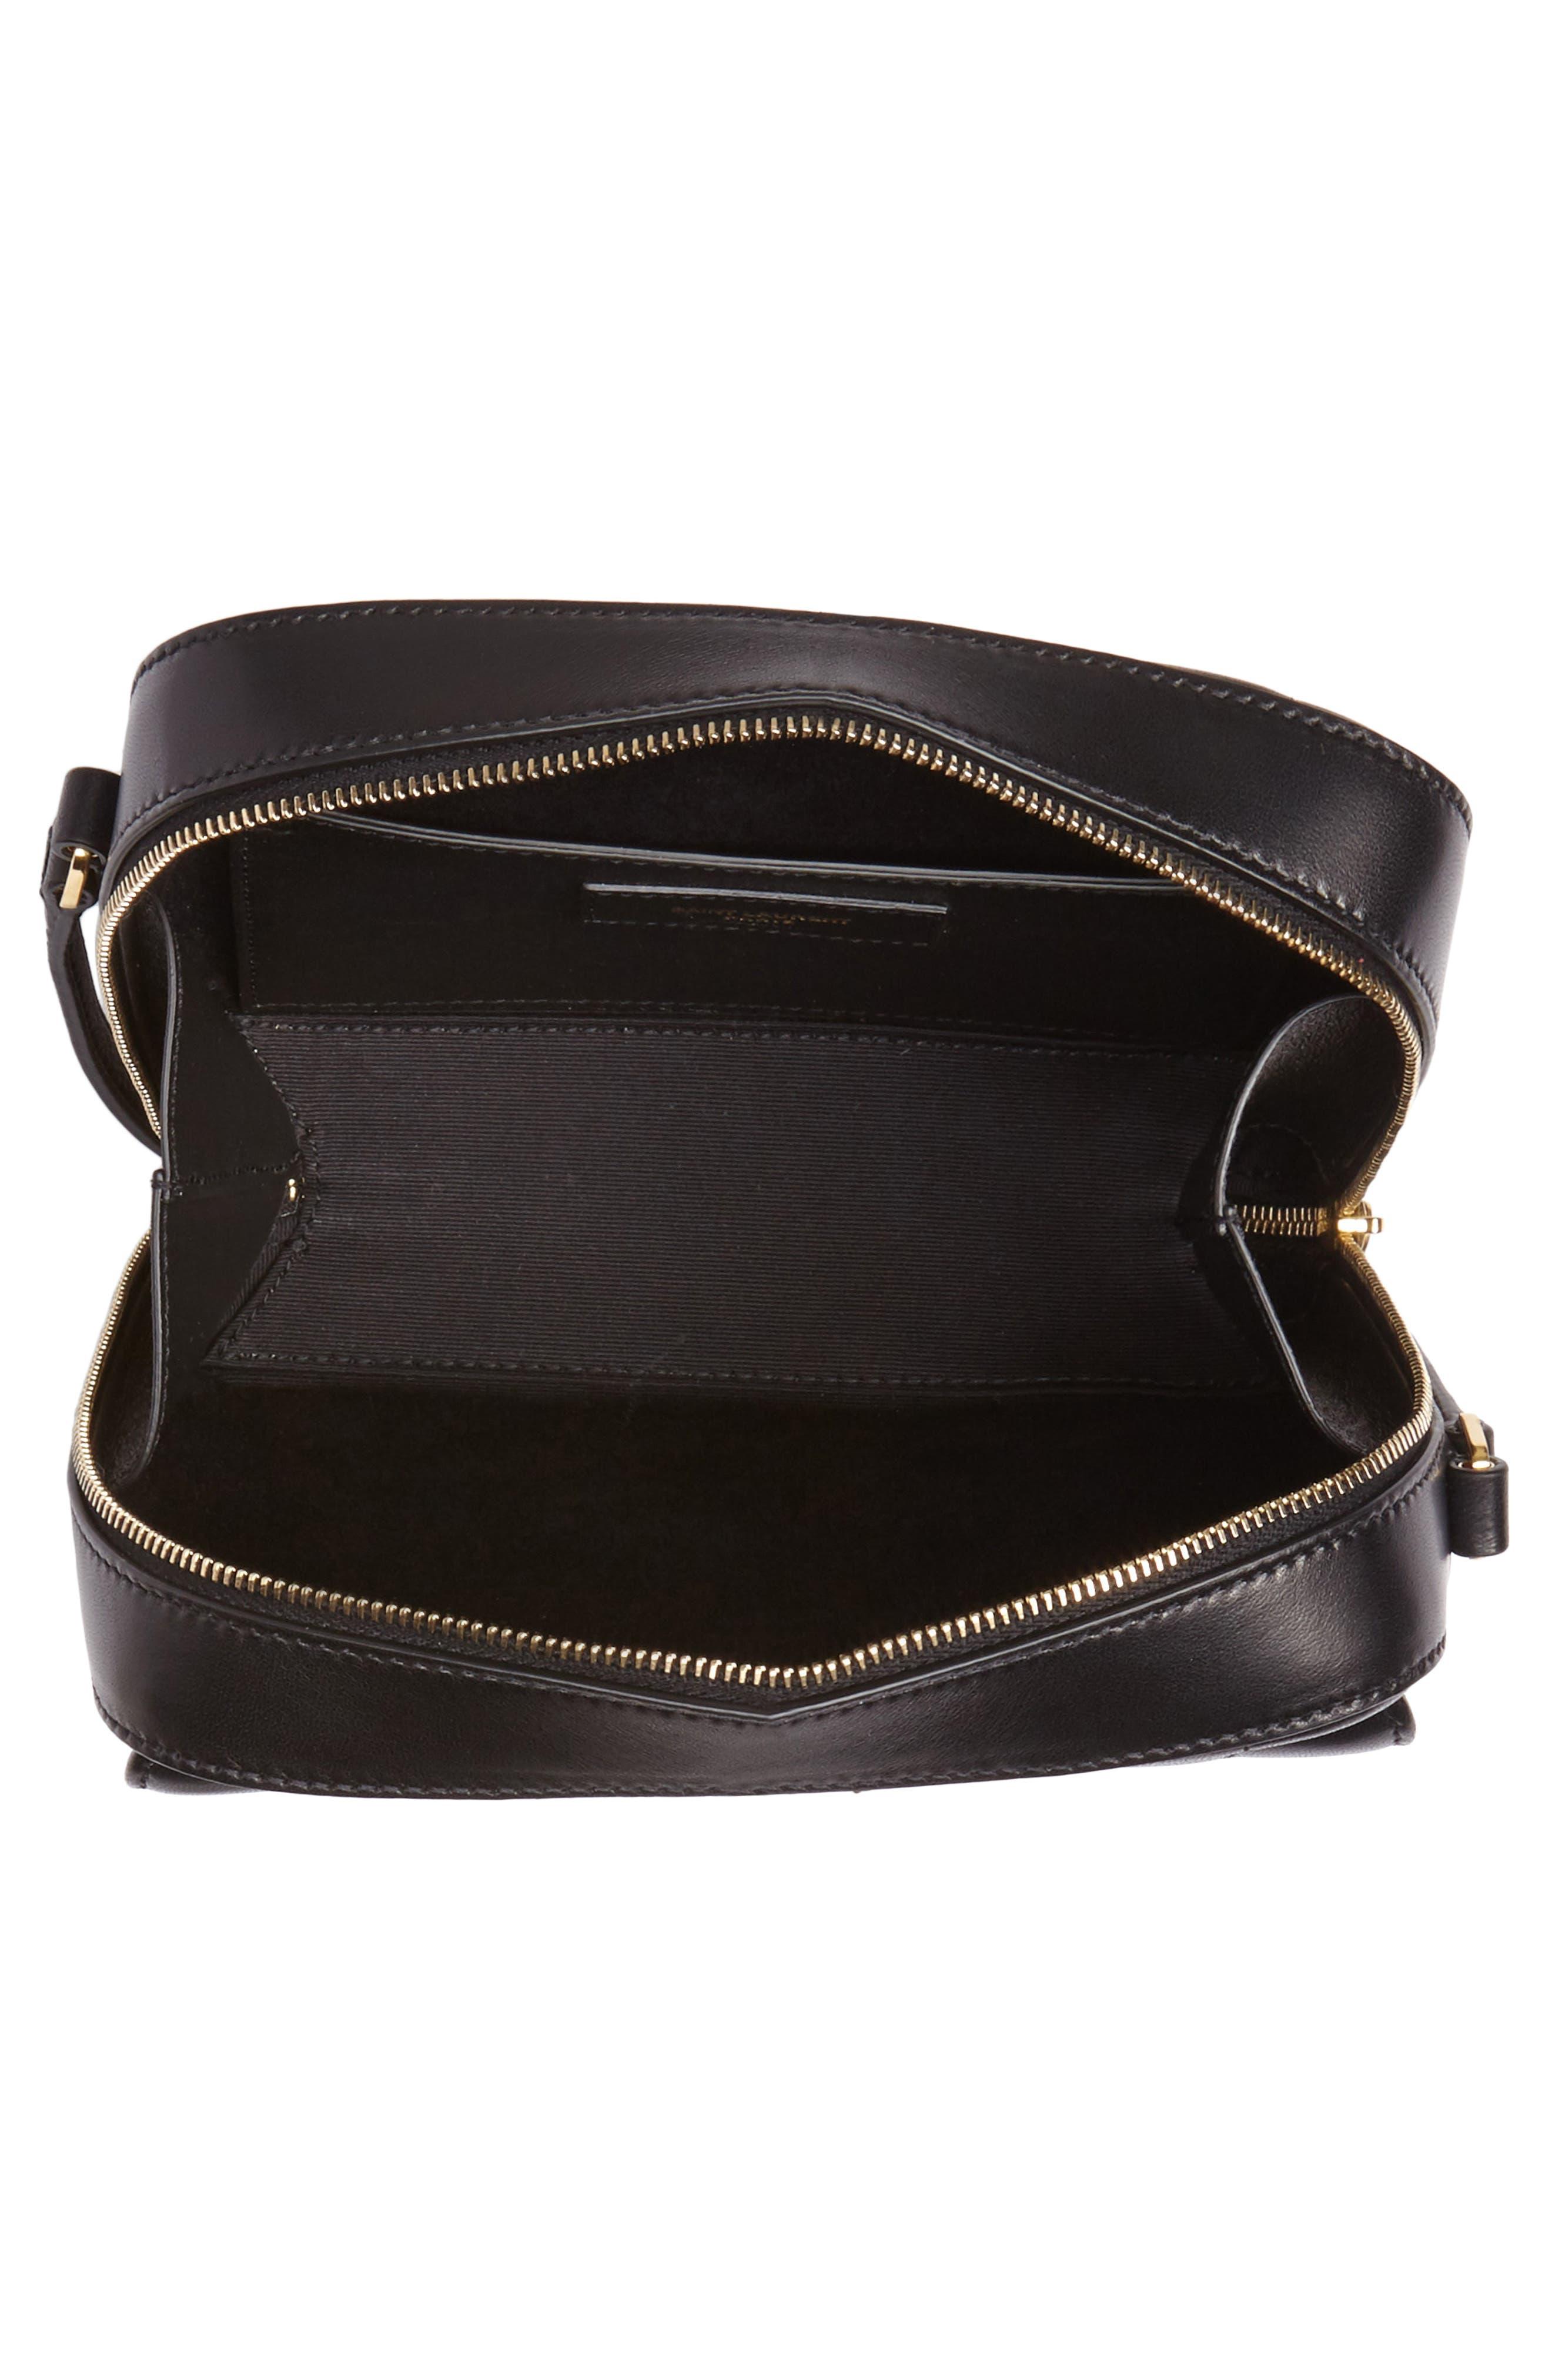 Vicky Leather Camera Bag,                             Alternate thumbnail 4, color,                             NOIR